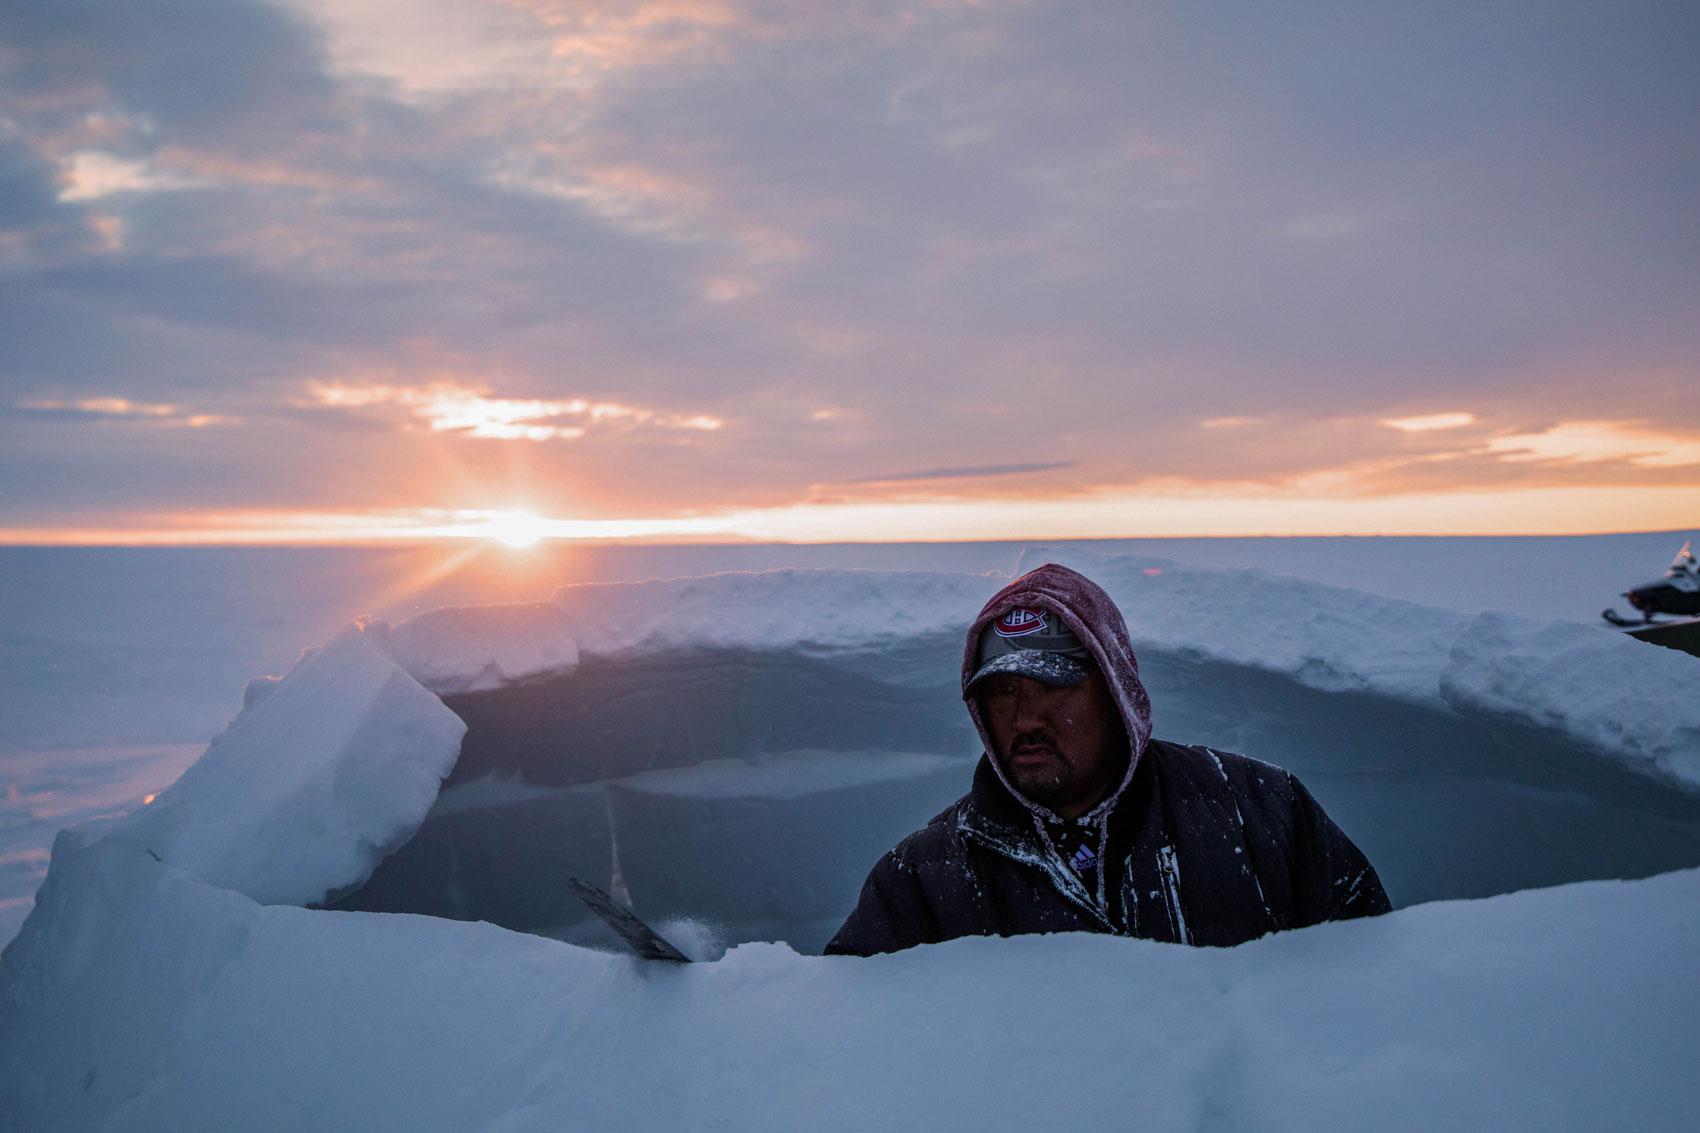 découverte de la culture inuite au Nunavik